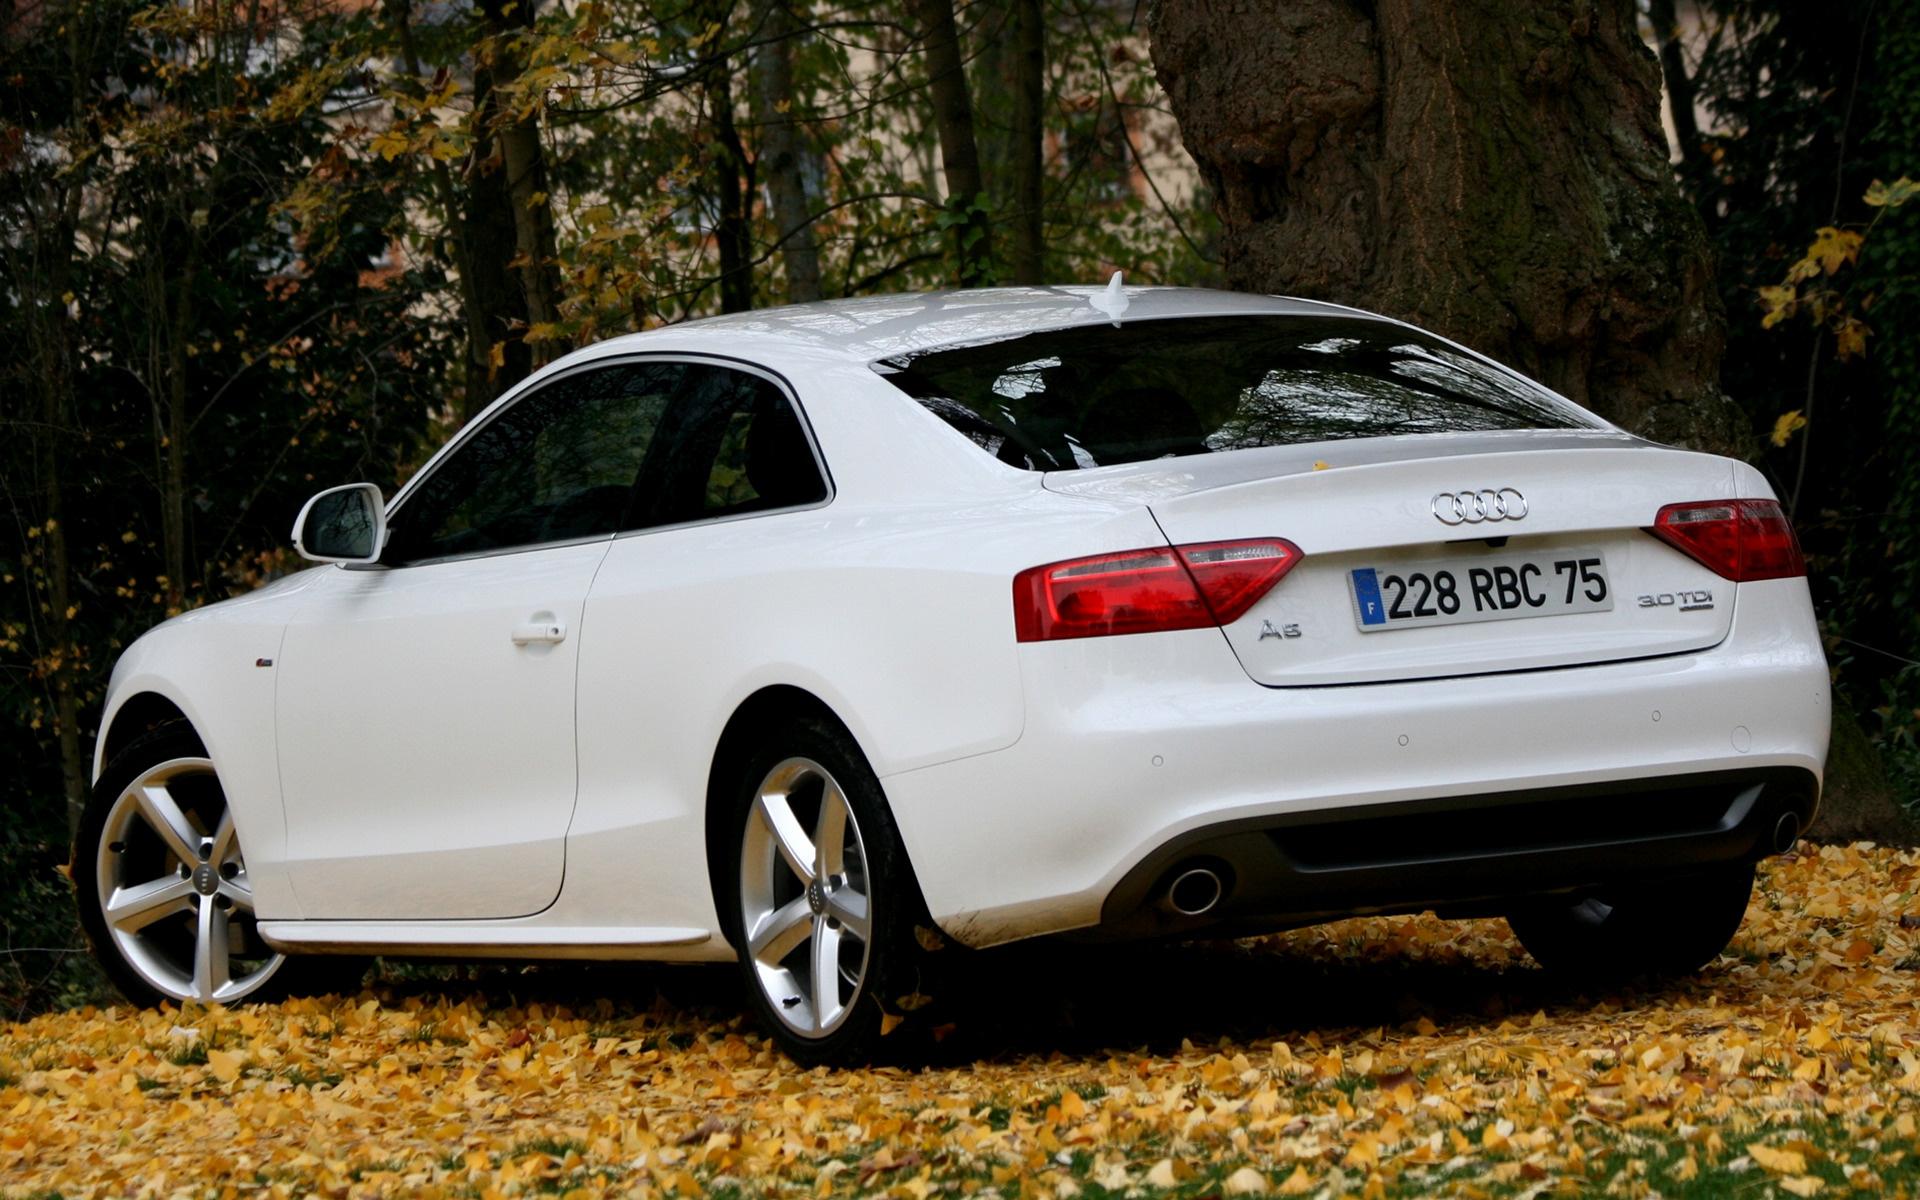 Kelebihan Kekurangan Audi A5 Coupe 2008 Murah Berkualitas